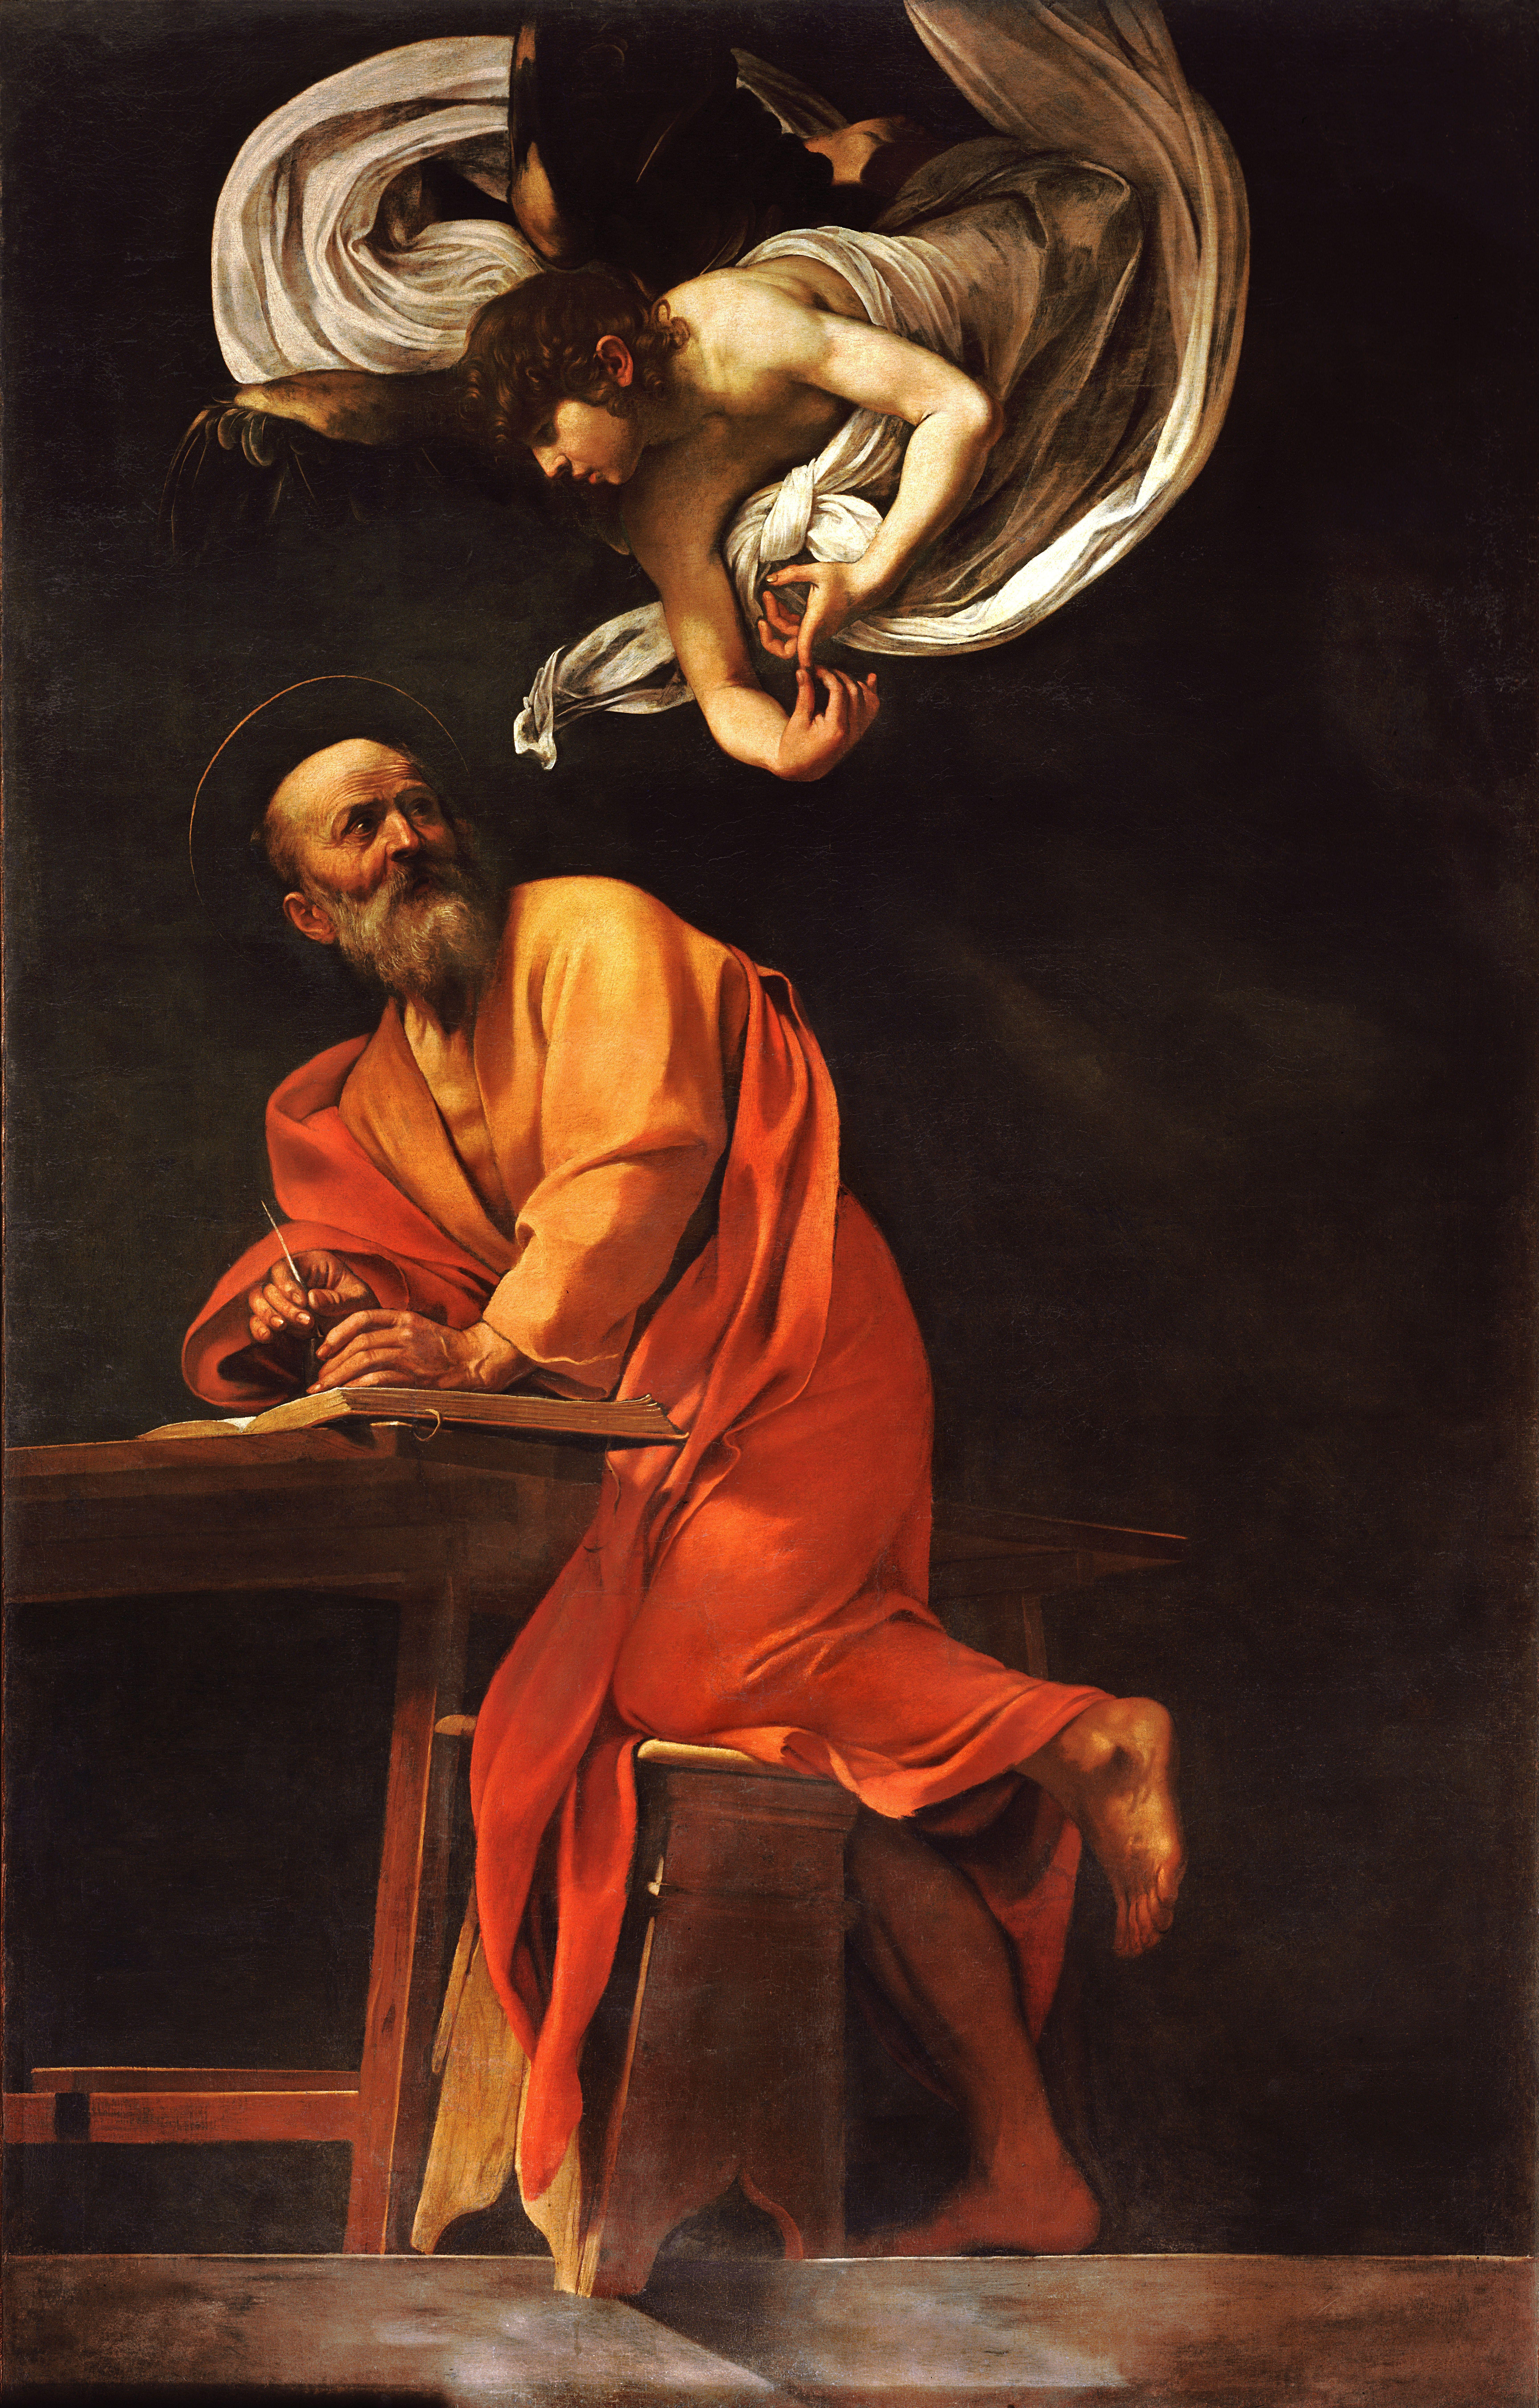 Saint Matthieu et l'Ange - Wikiwand - 11850.7KB